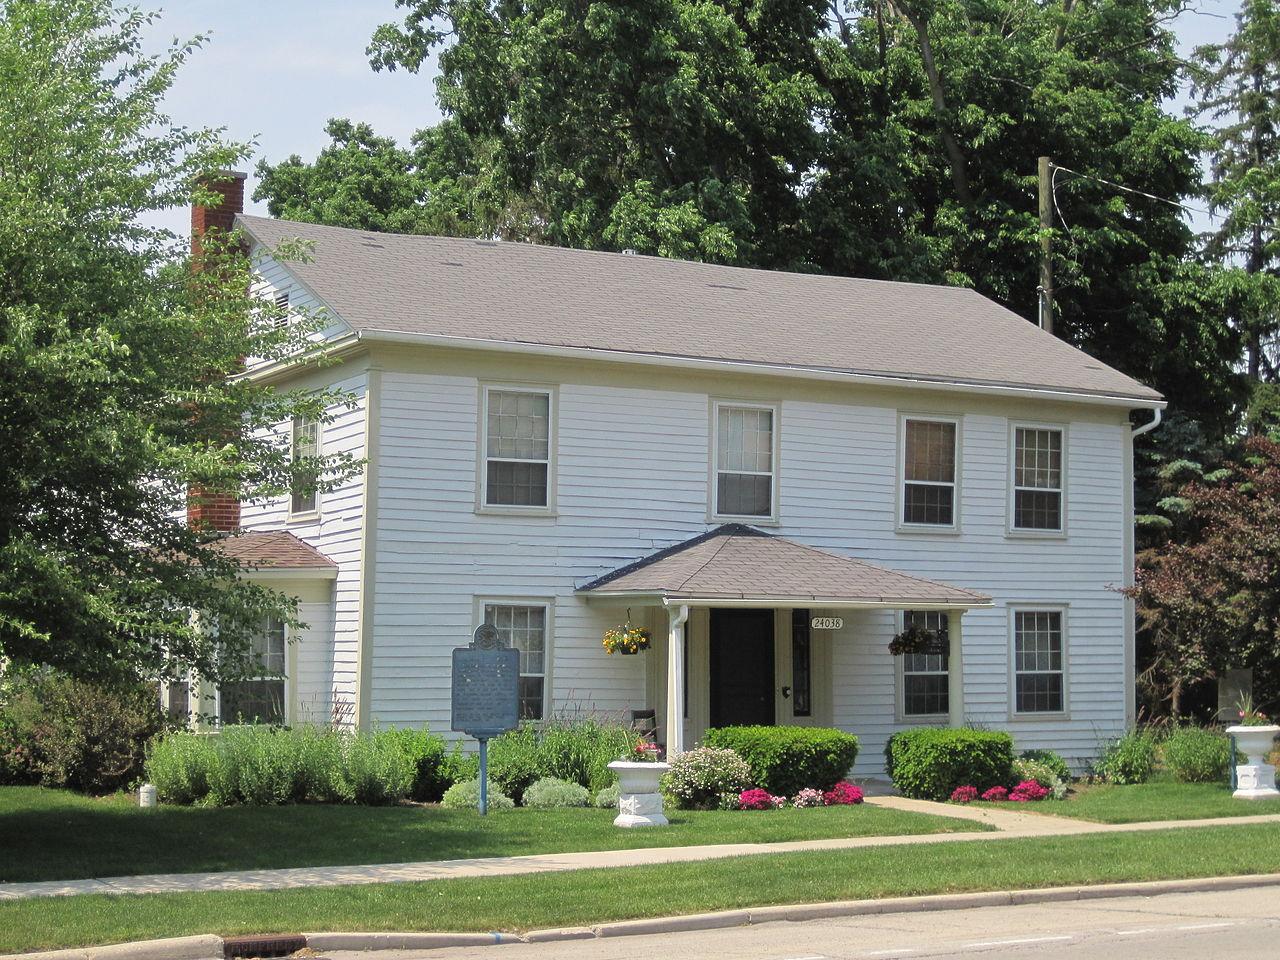 Halfway House (Source: Wiki Media).